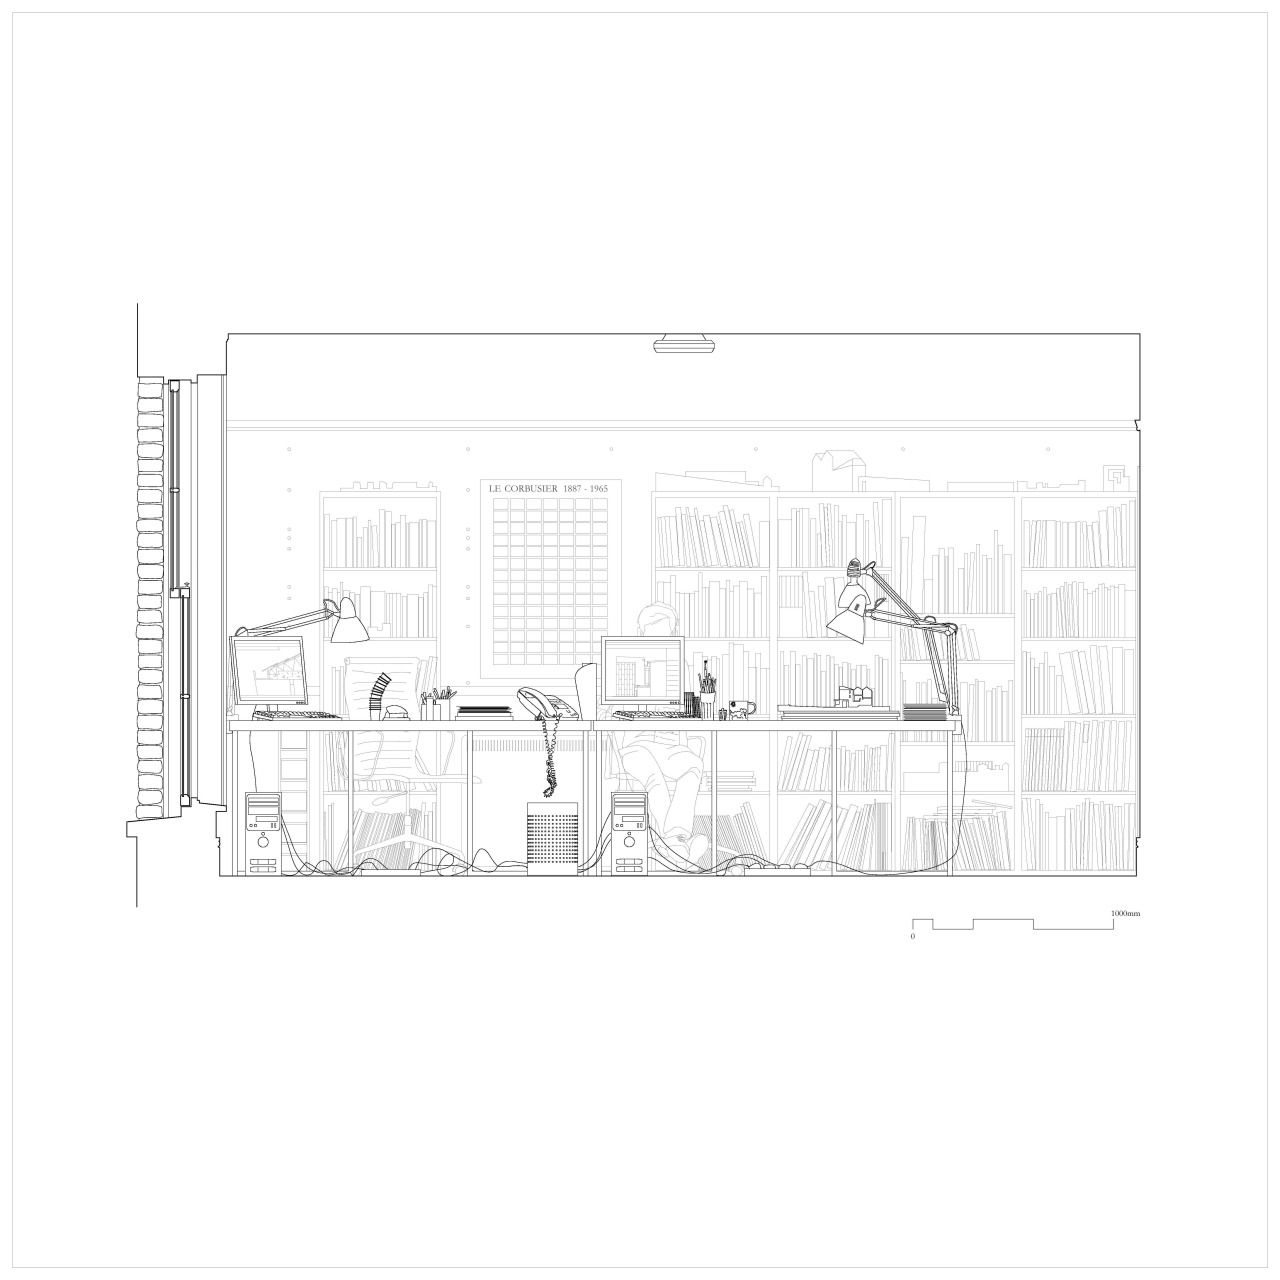 plattenbaustudio: 19A Baggot Street Elevation drawing of GKMP Architects office, Baggot Street, Dublin. Image Copyright © 2014   Jennifer O'Donnell, Jonathan Janssens